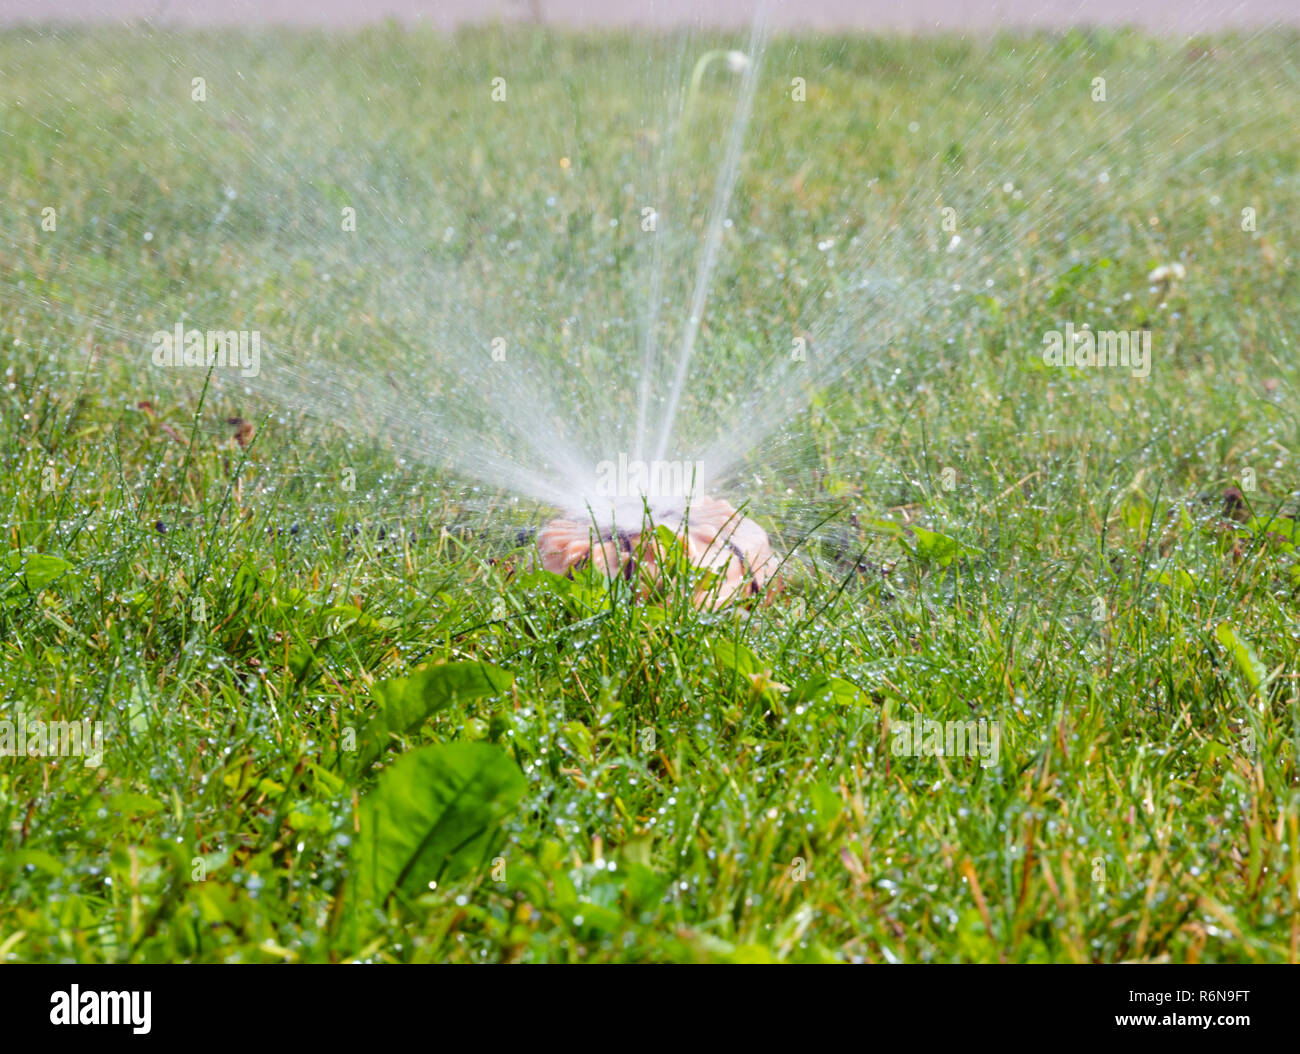 Sprinkler sprinkler system of the park in working condition - Stock Image